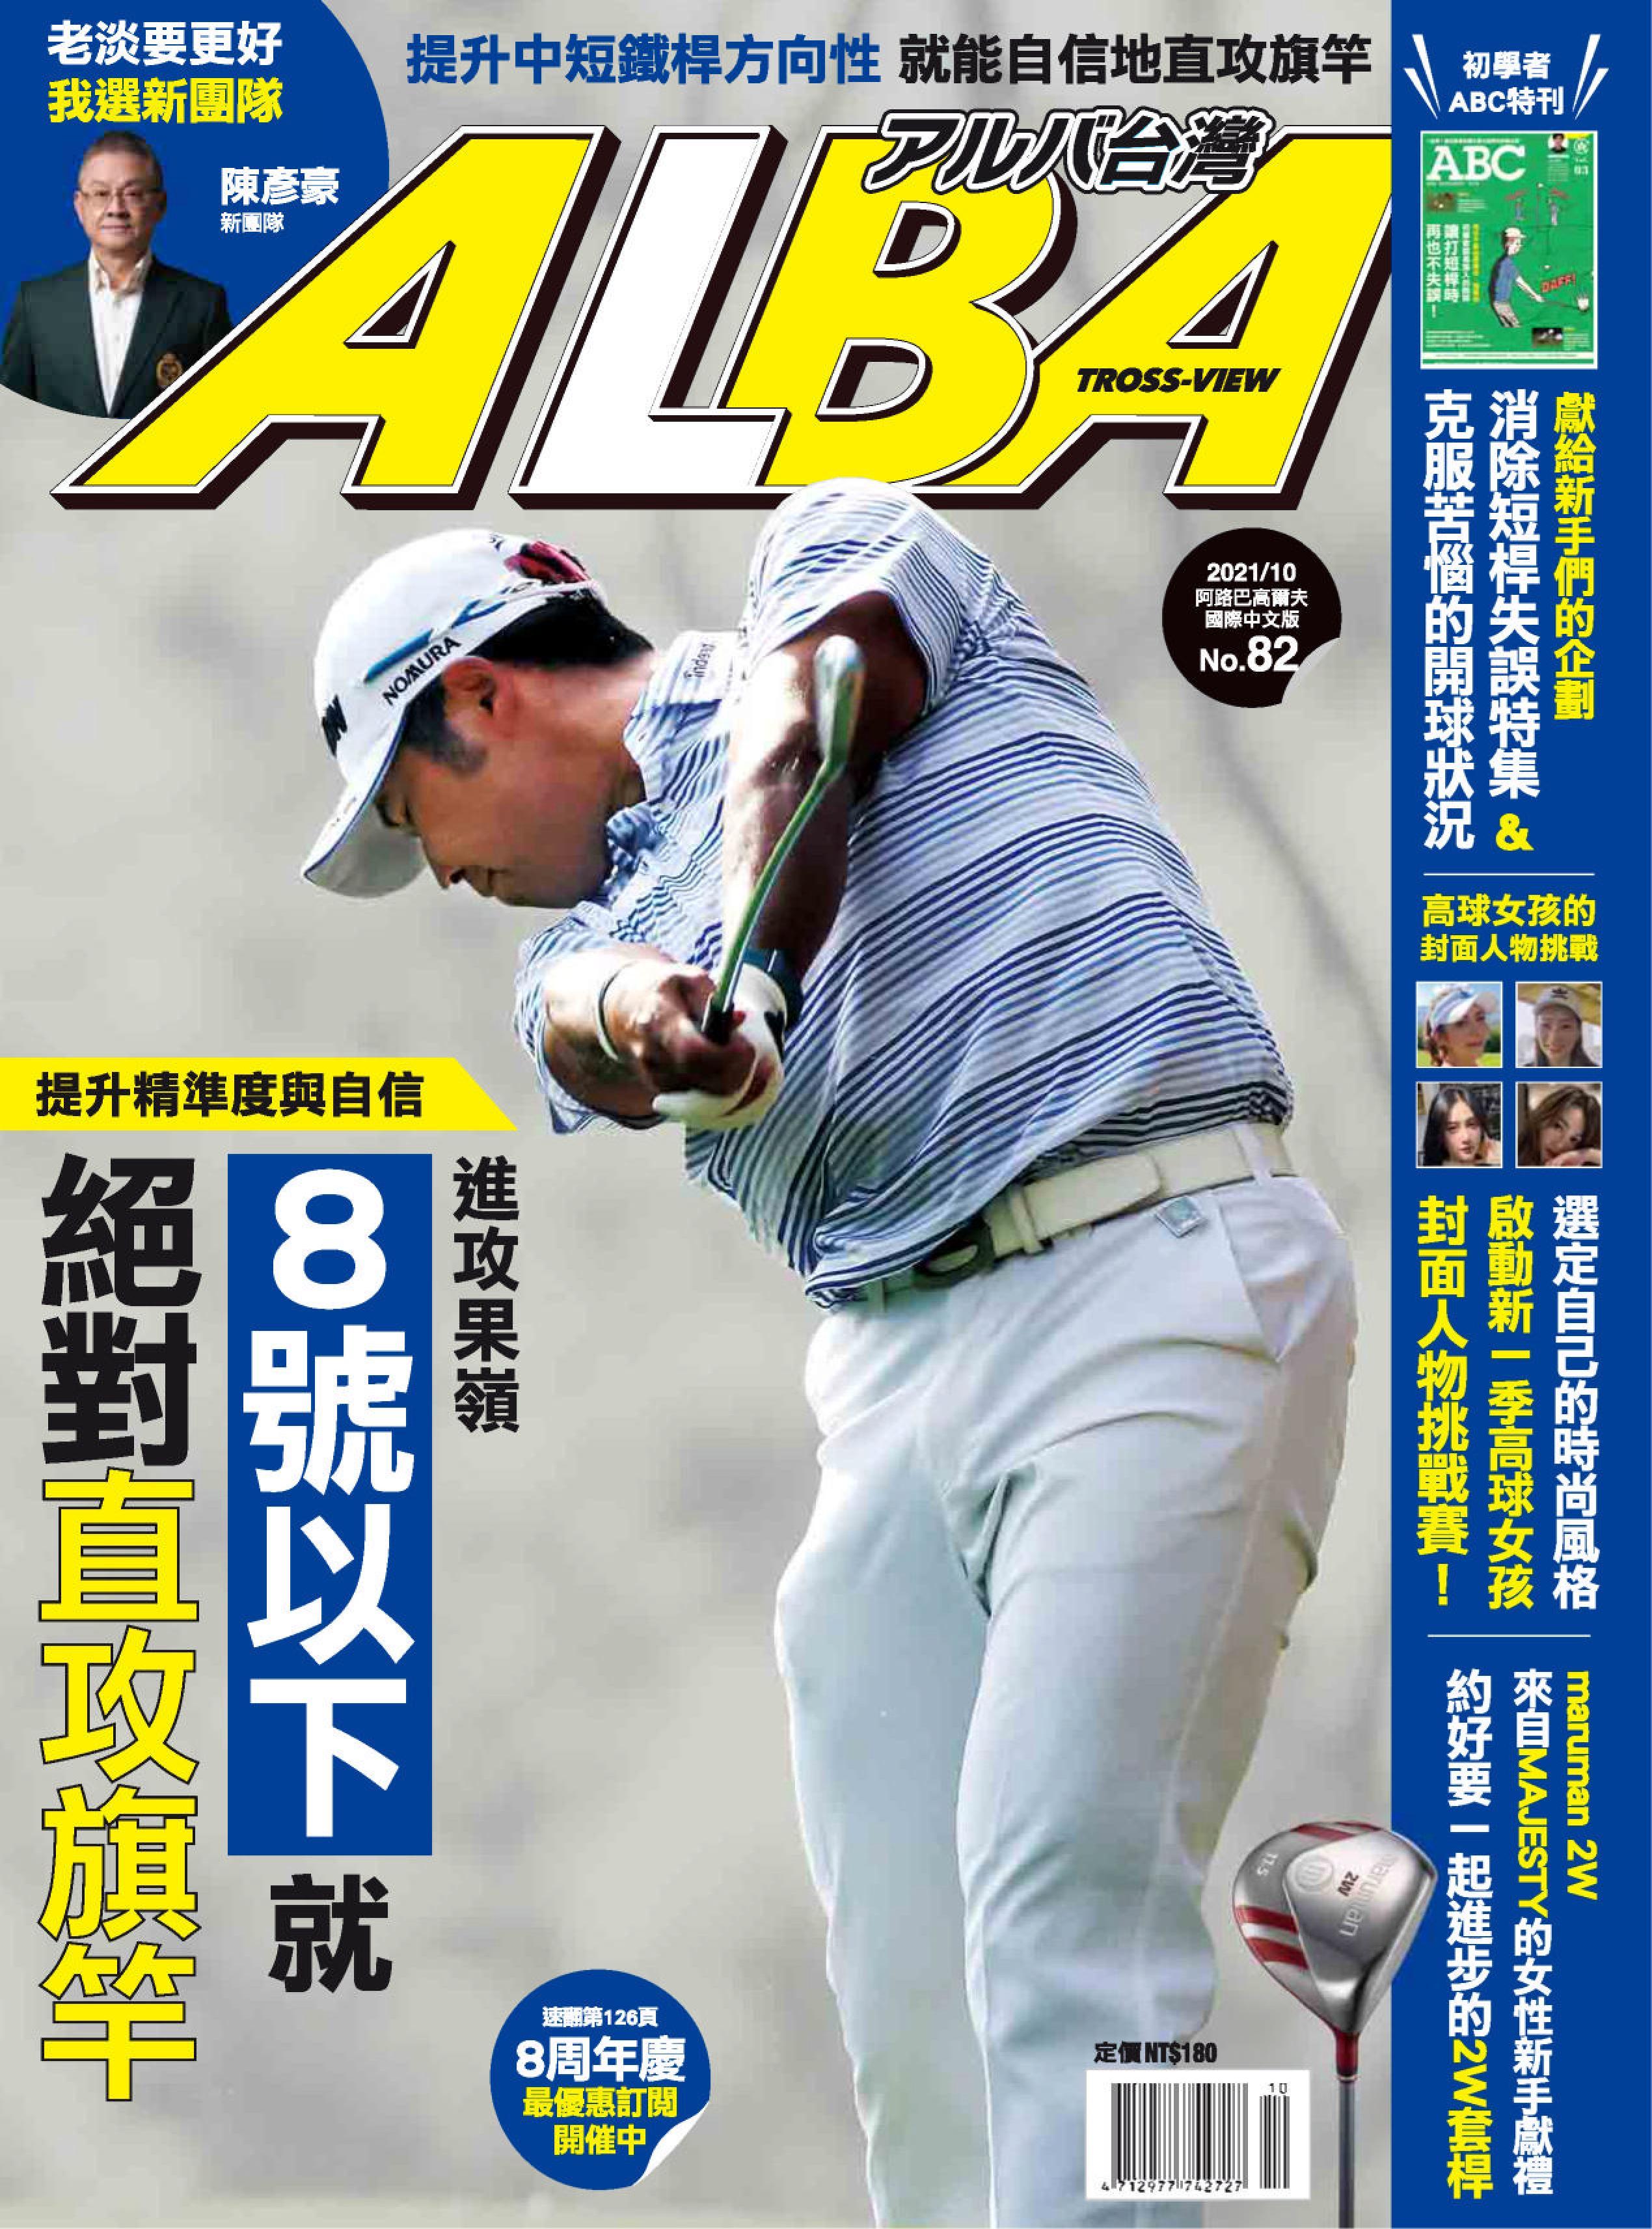 Alba Tross-View 阿路巴高爾夫 國際中文版 - 十月 2021